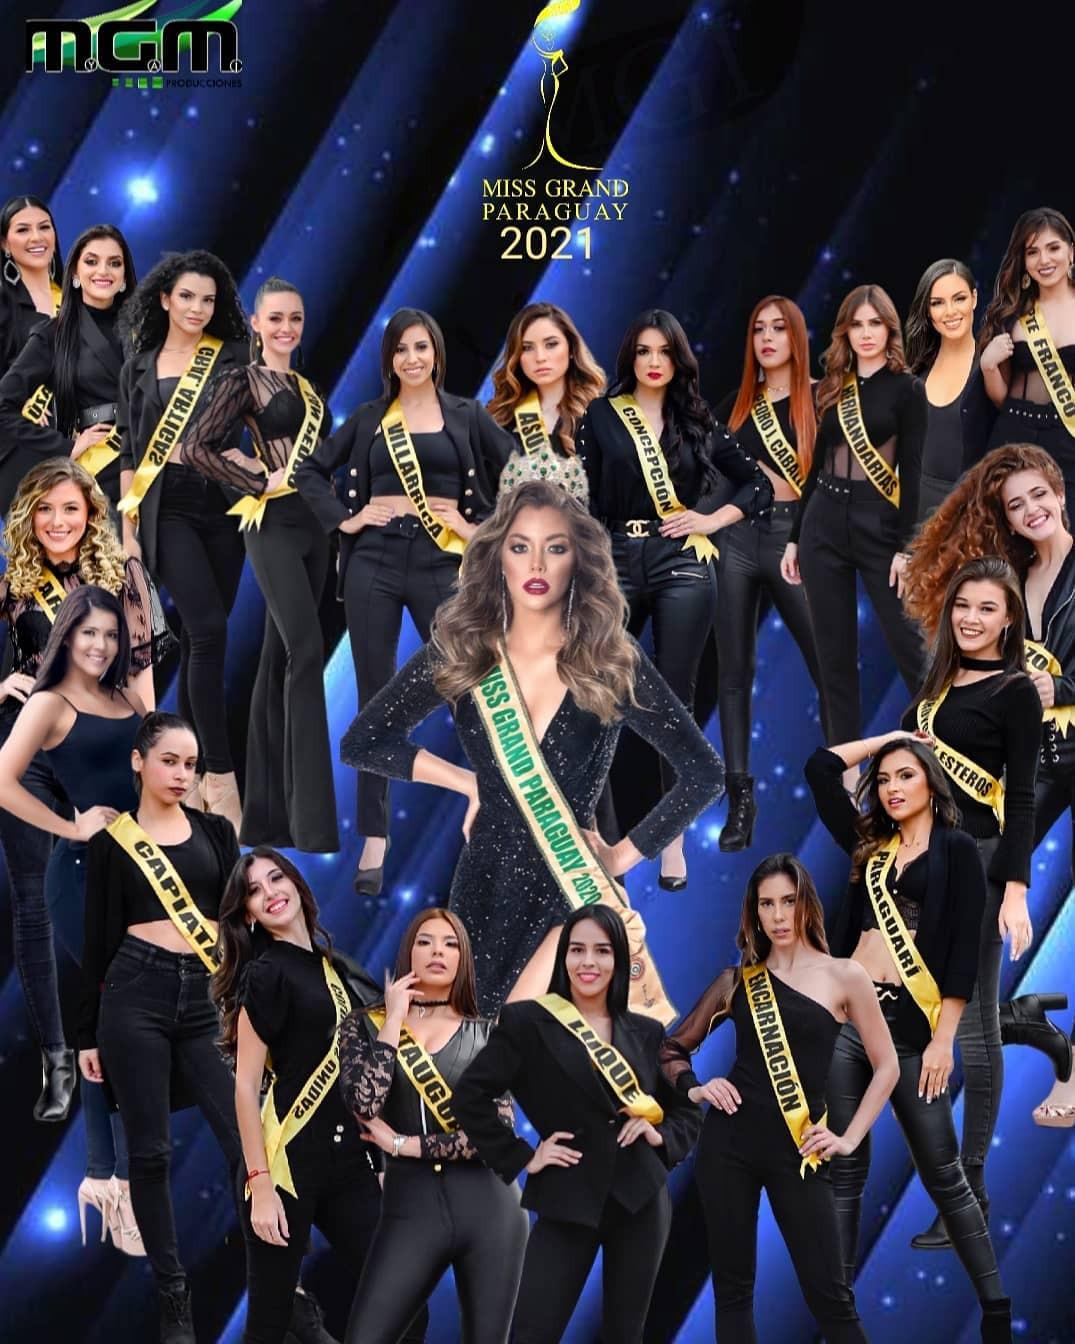 candidatas a miss grand paraguay 2021. final: 3 july. - Página 2 OC5Oml